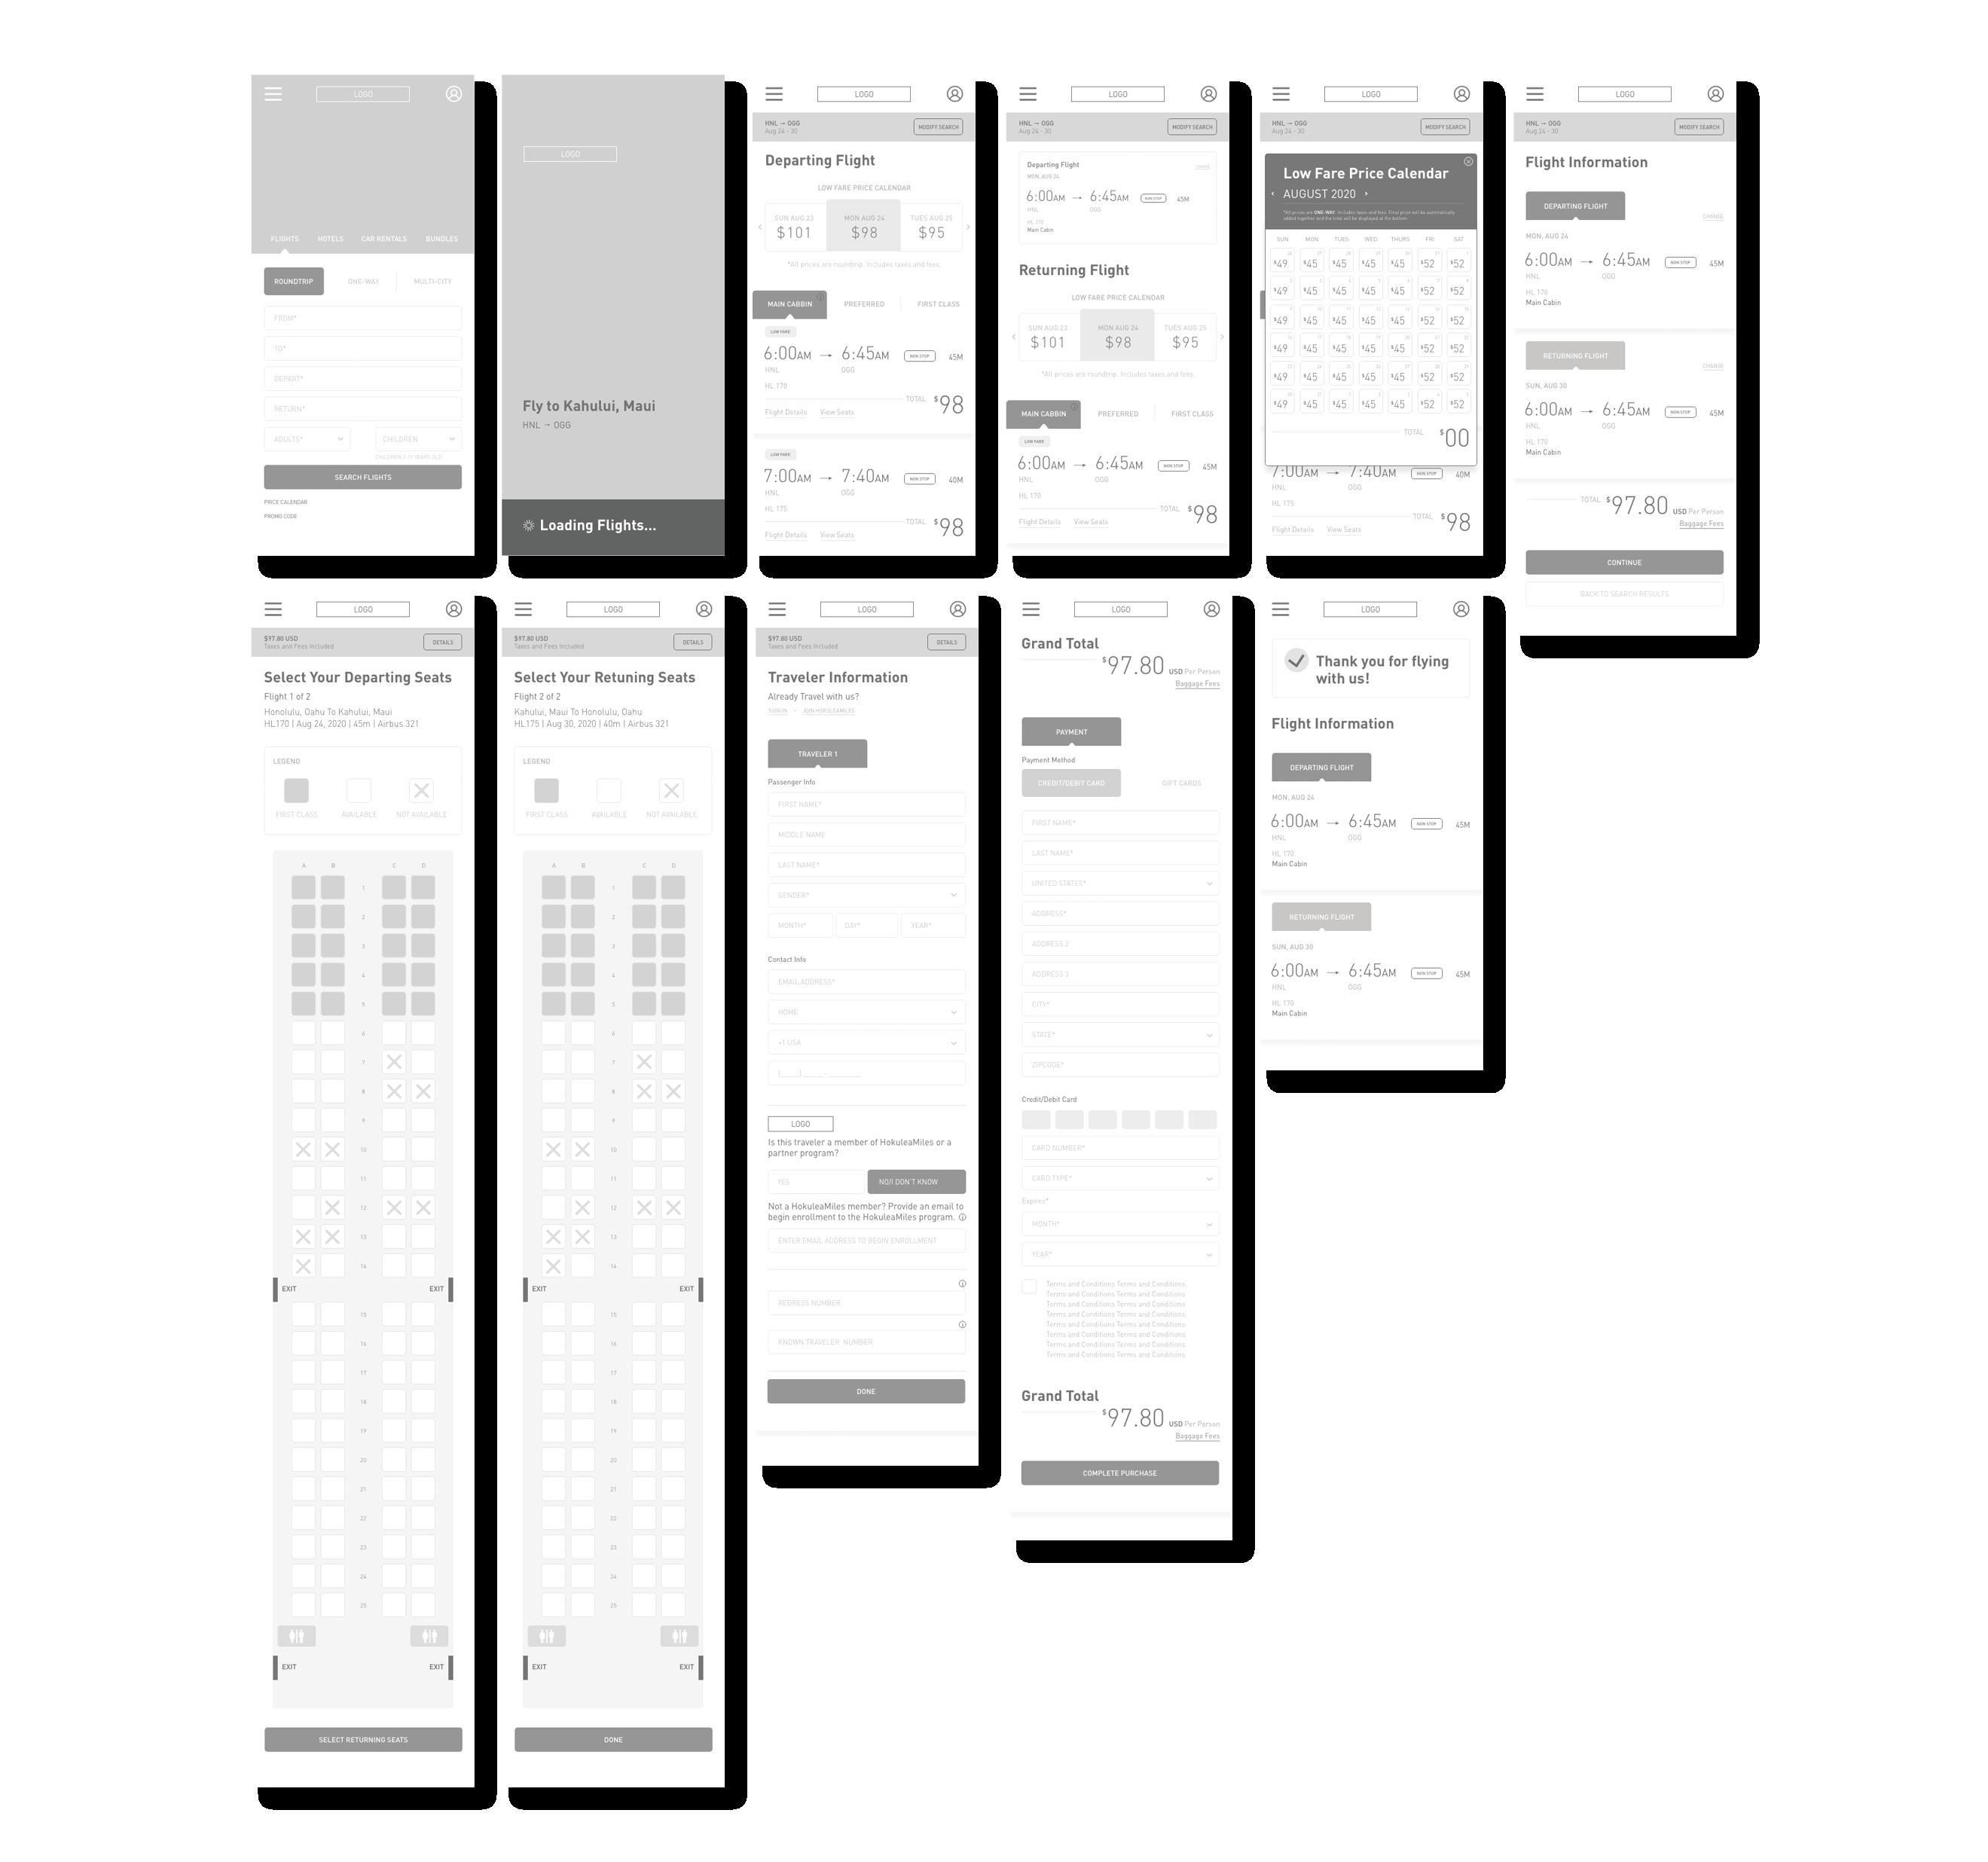 lofi wireframes of the hokulea website on mobile browser